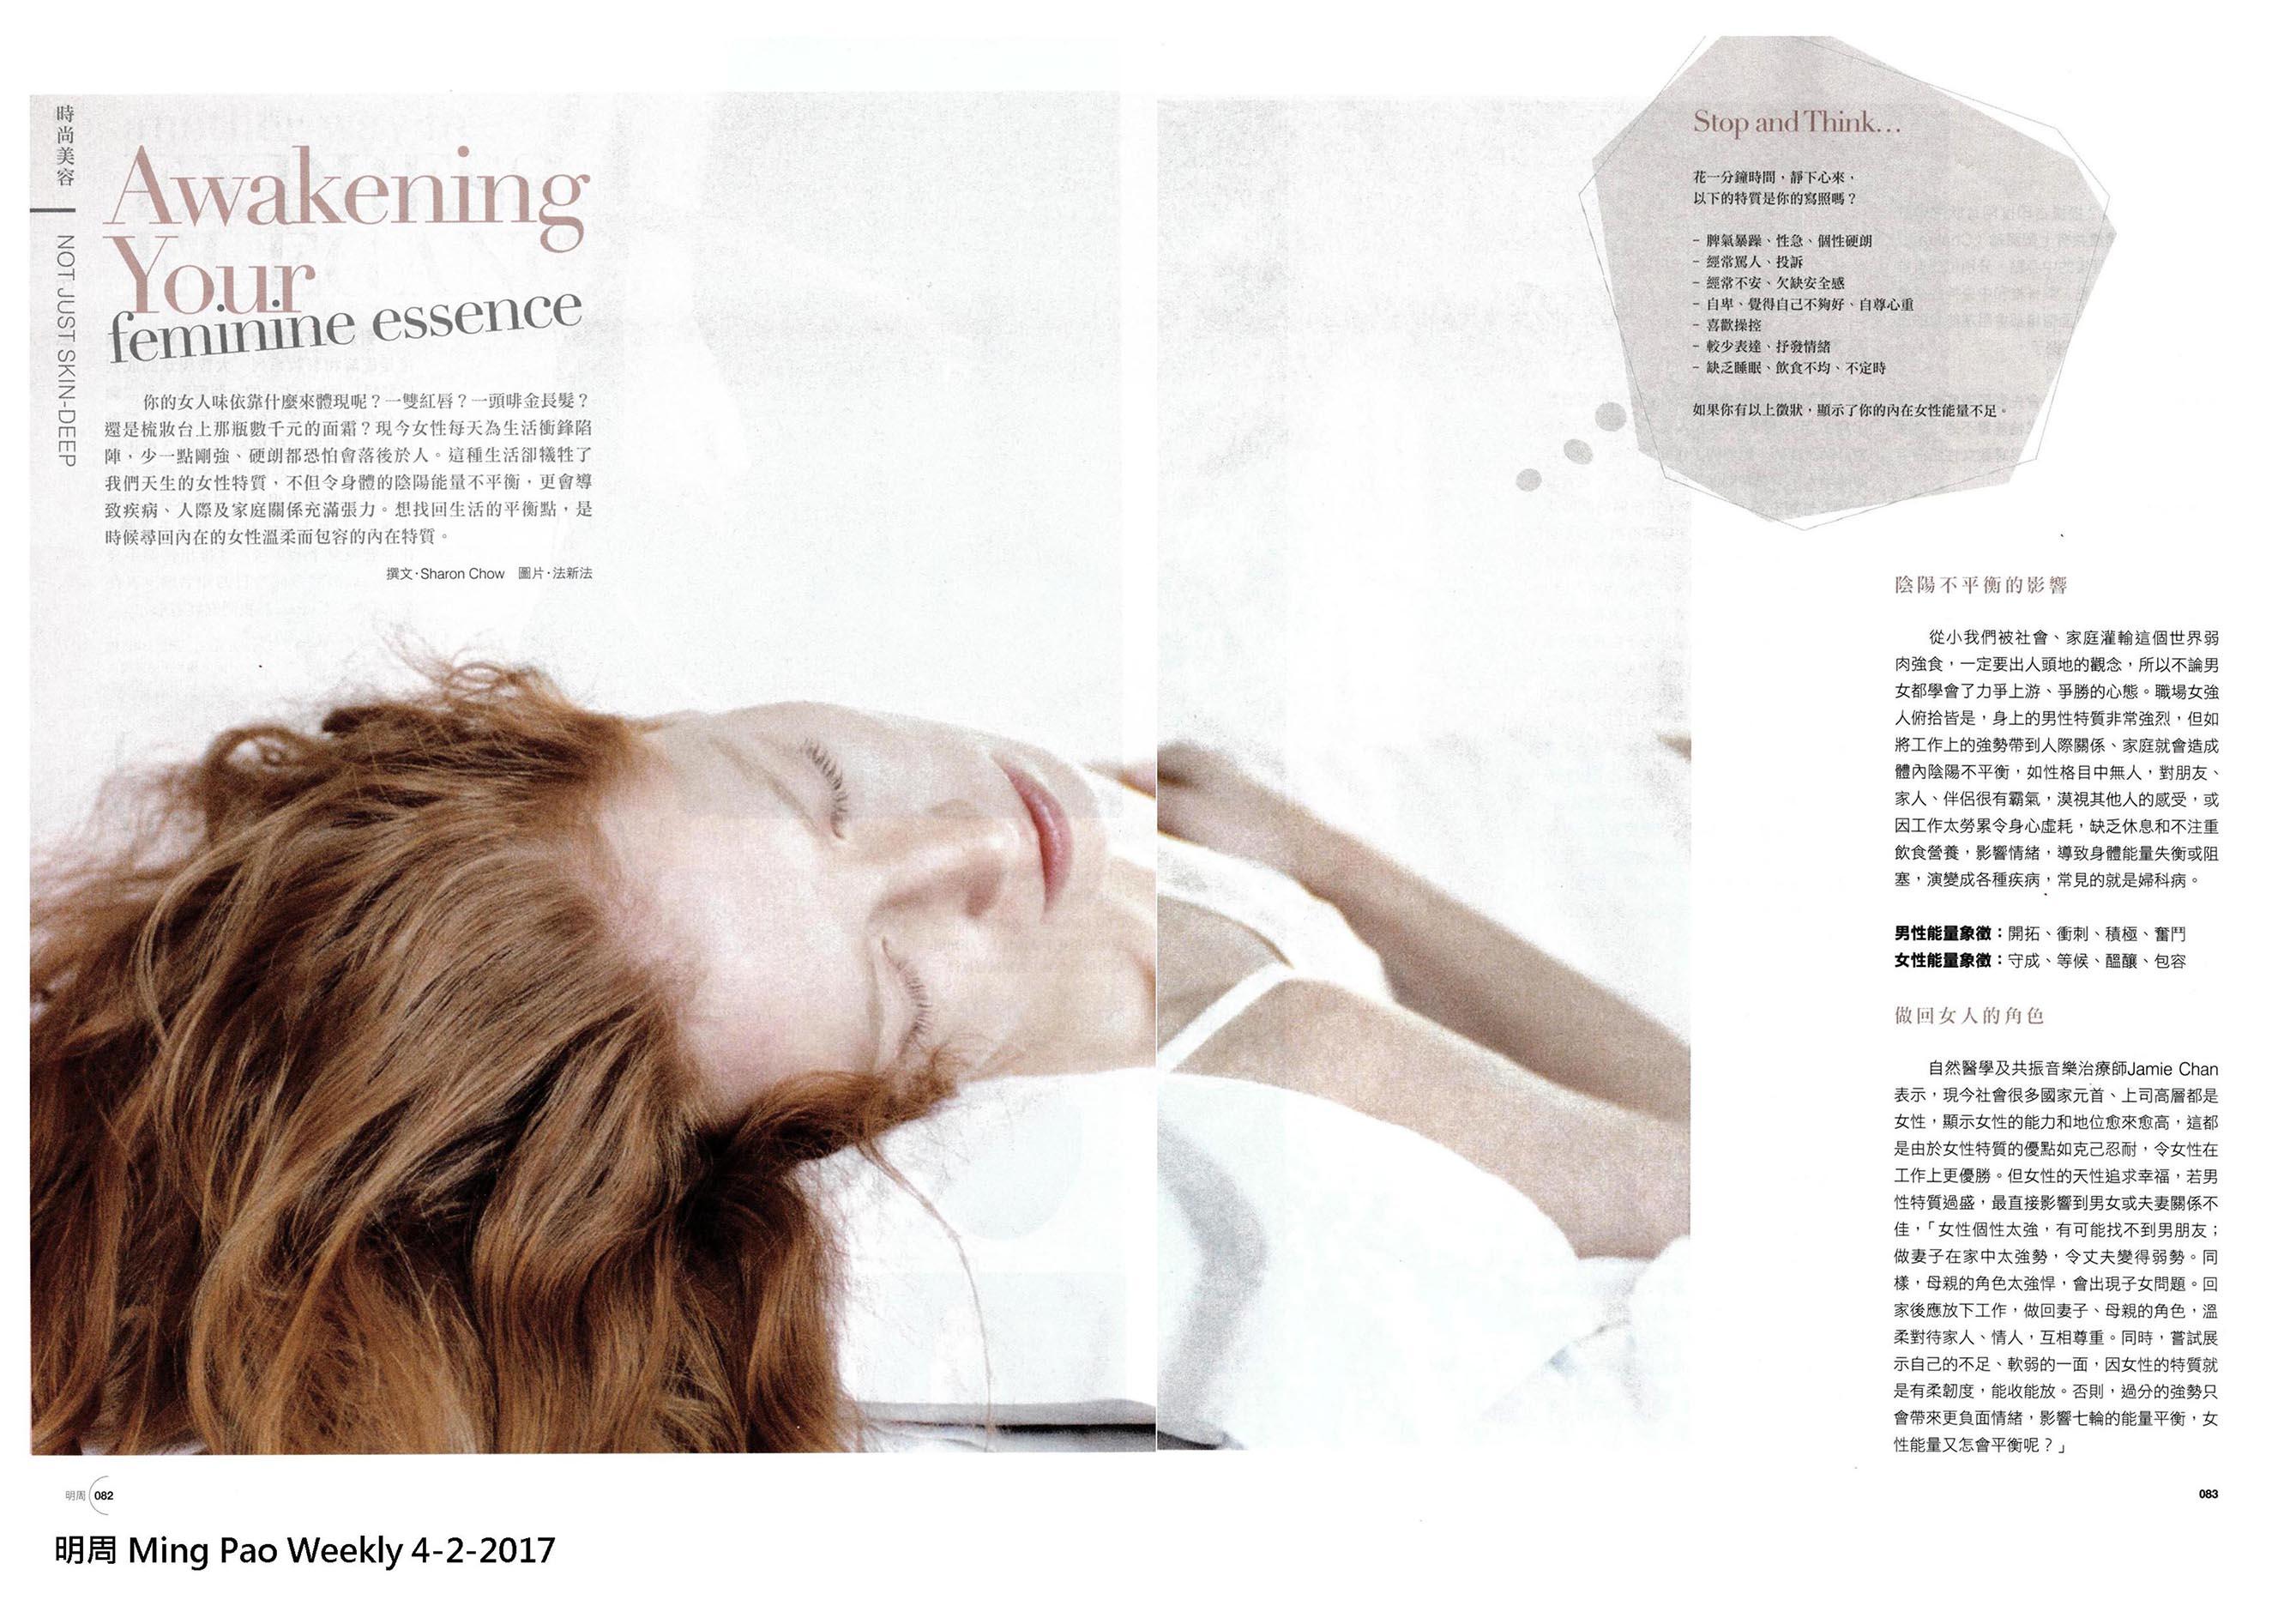 明周 Ming Pao Weekly 4-2-2017-a